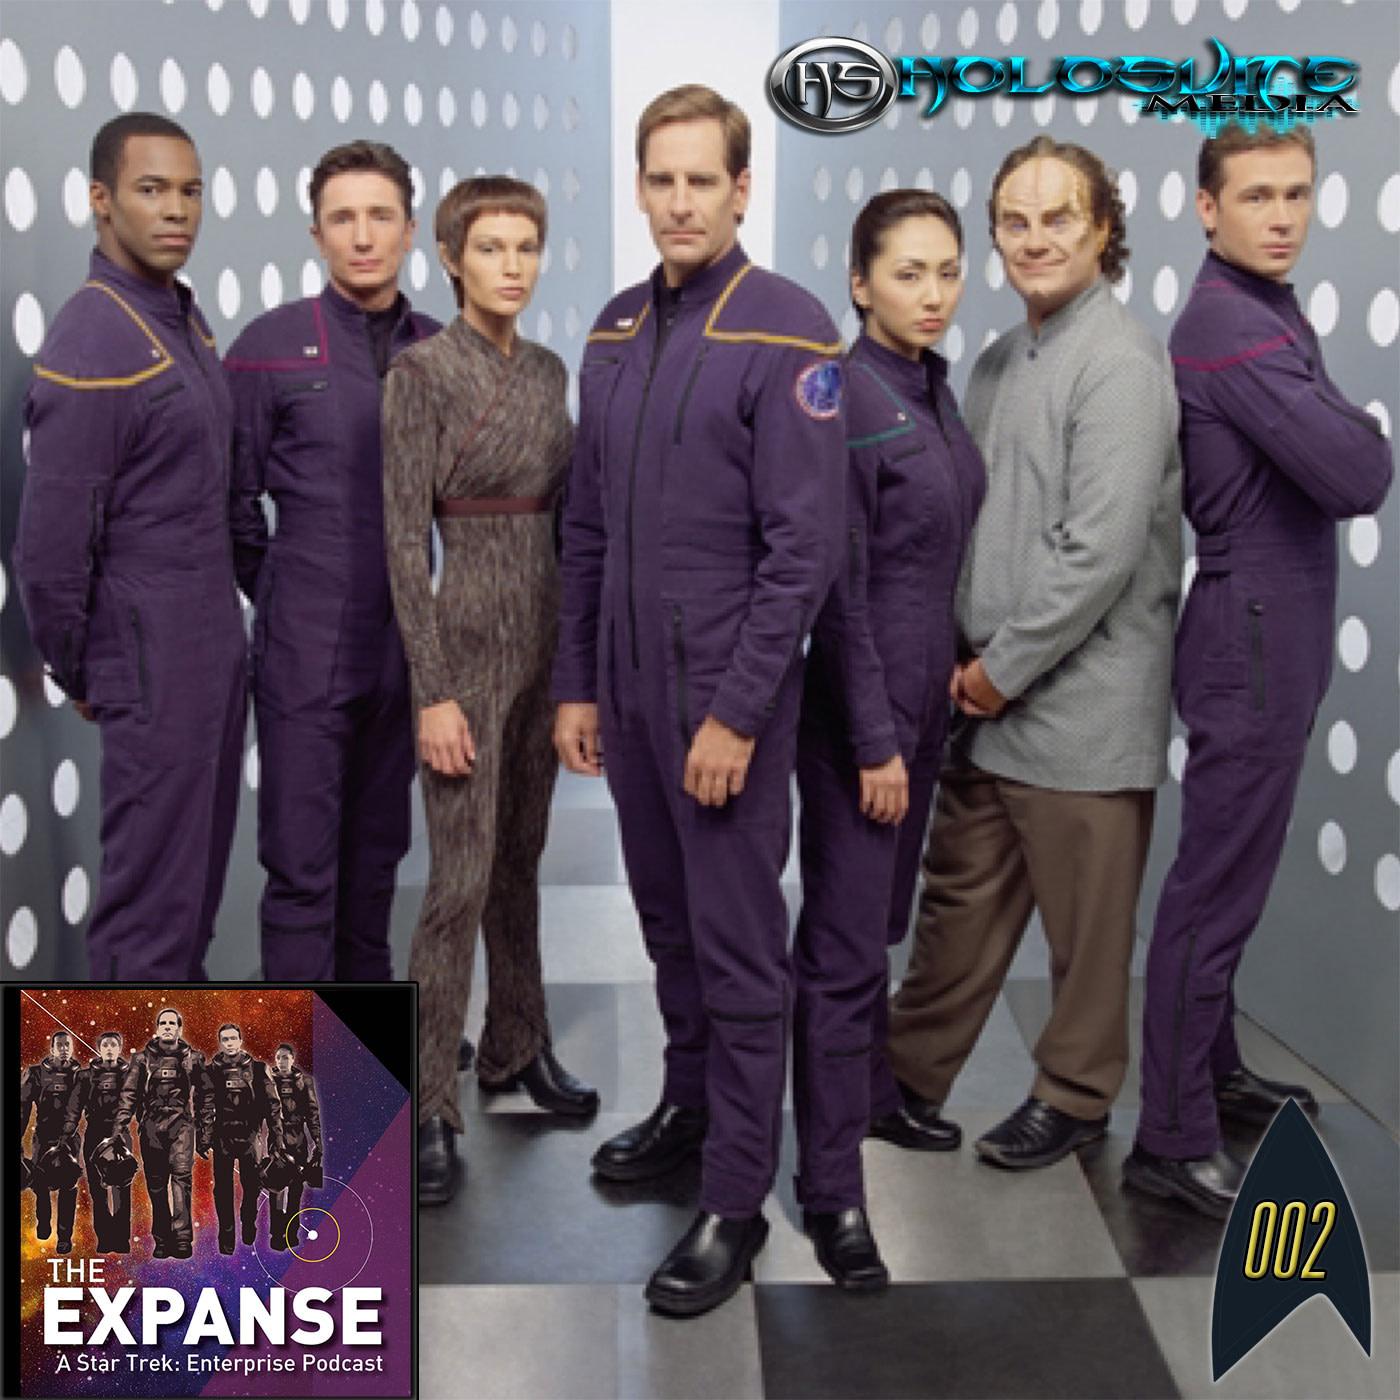 The Expanse Episode 2